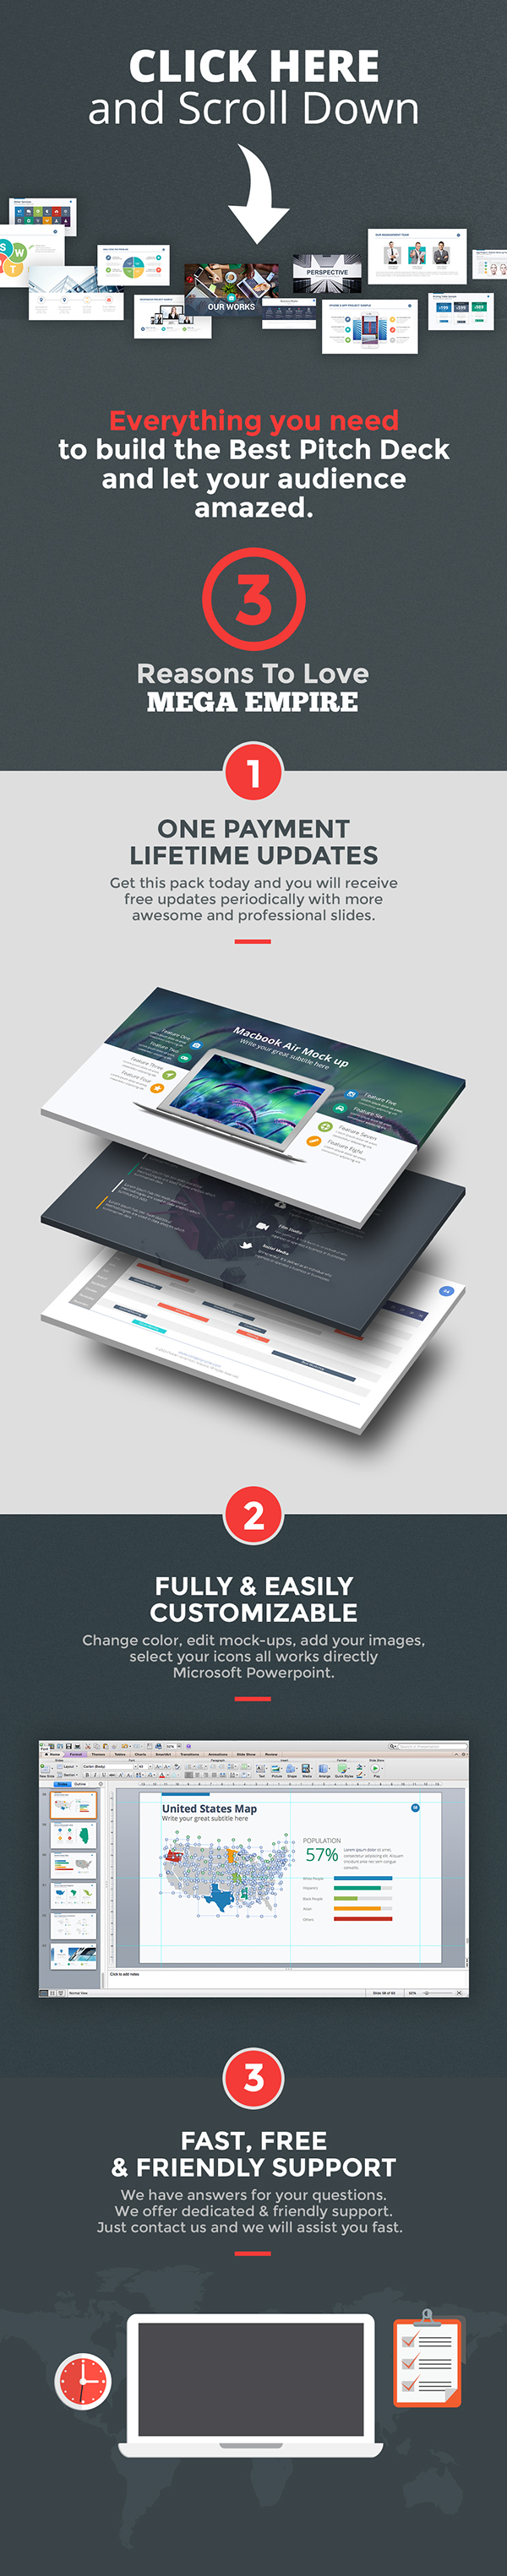 MEGA EMPIRE Powerpoint Template Bundle on Behance